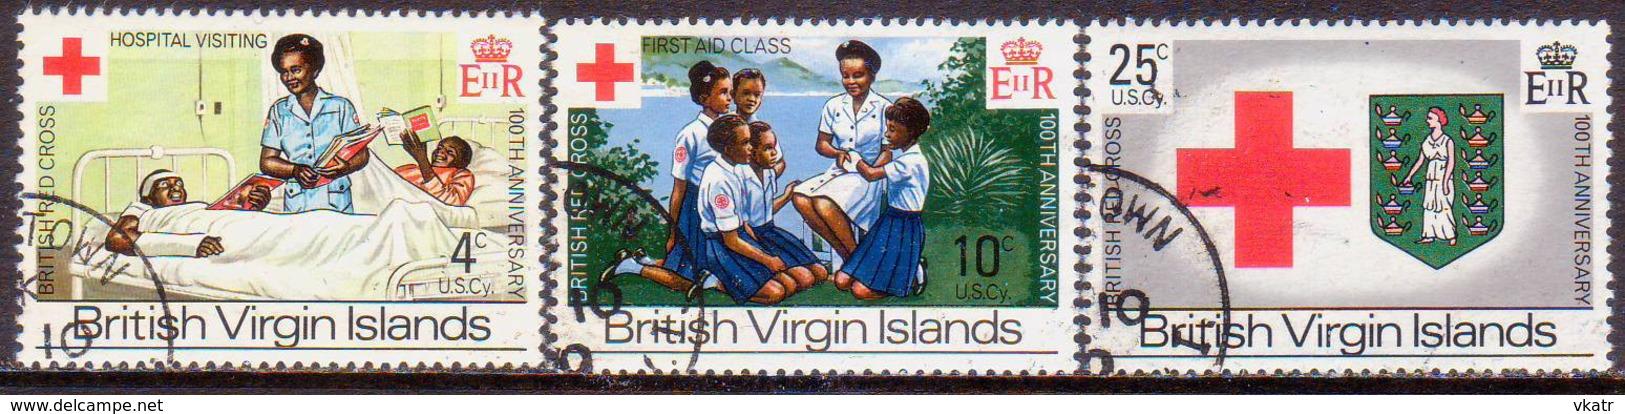 BRITISH VIRGIN ISLANDS 1970 SG 260-62 Compl.set Used British Red Cross - British Virgin Islands